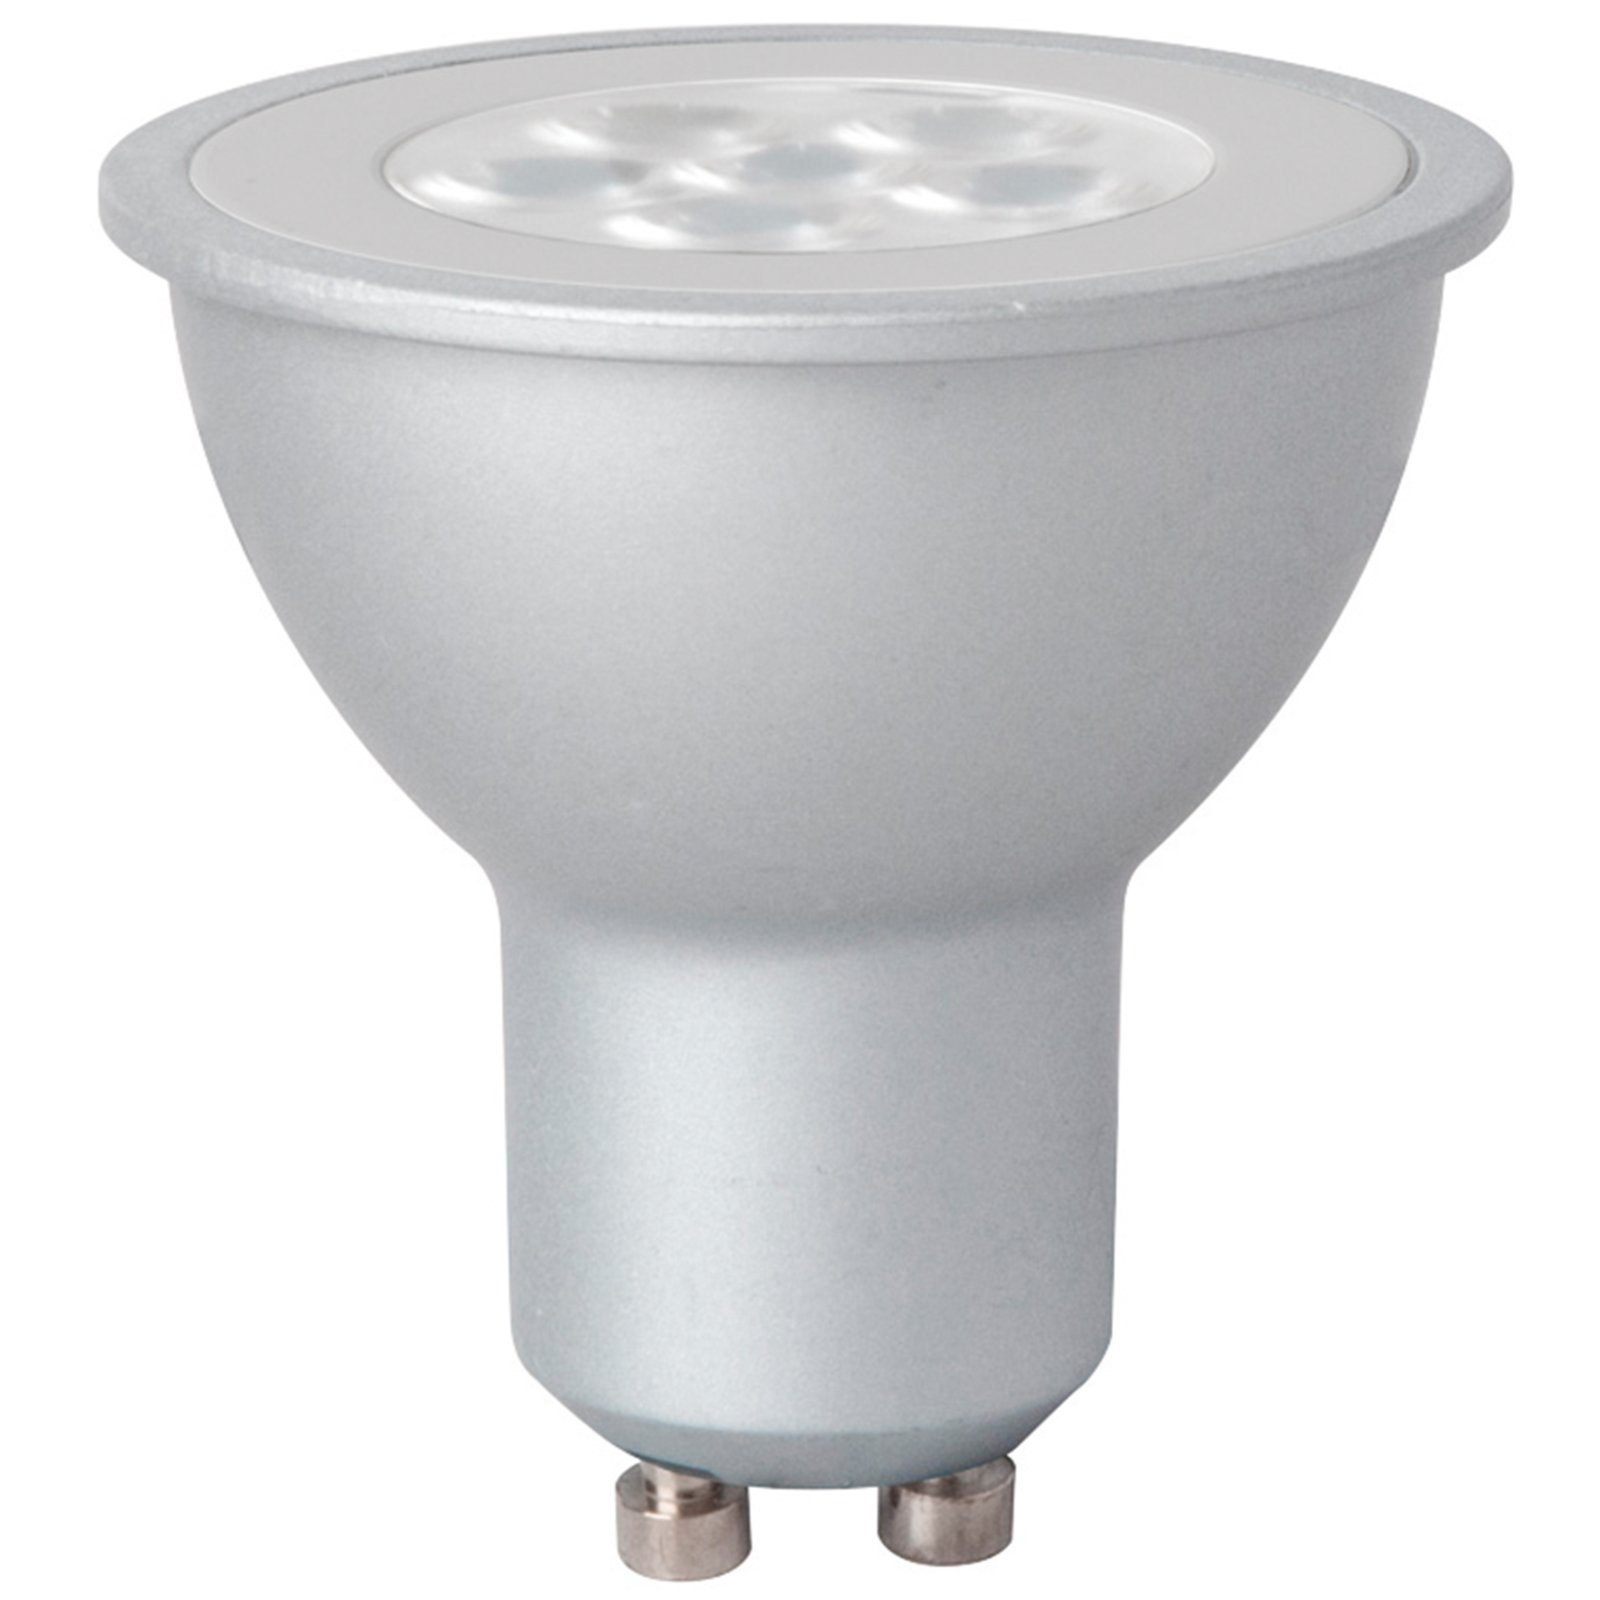 LED-Reflektor-Leuchtmittel MEGMAN - GU10 930 - 6 Watt